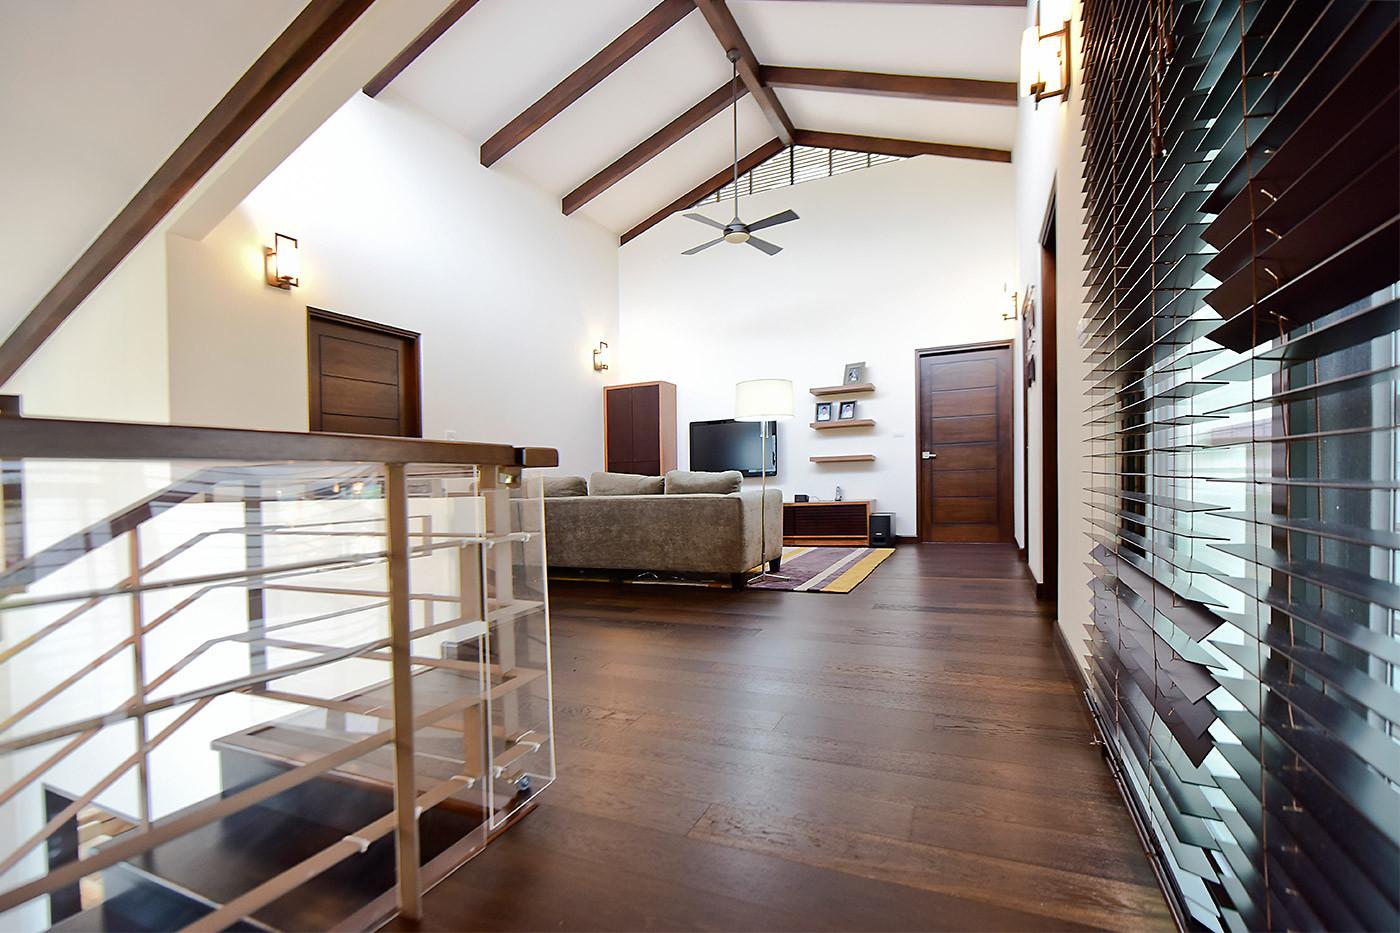 jb hardwood floors of hardwood floors laminate floors ceramic and porcelain tiles with hardwood floors for living room by ka¤hrs